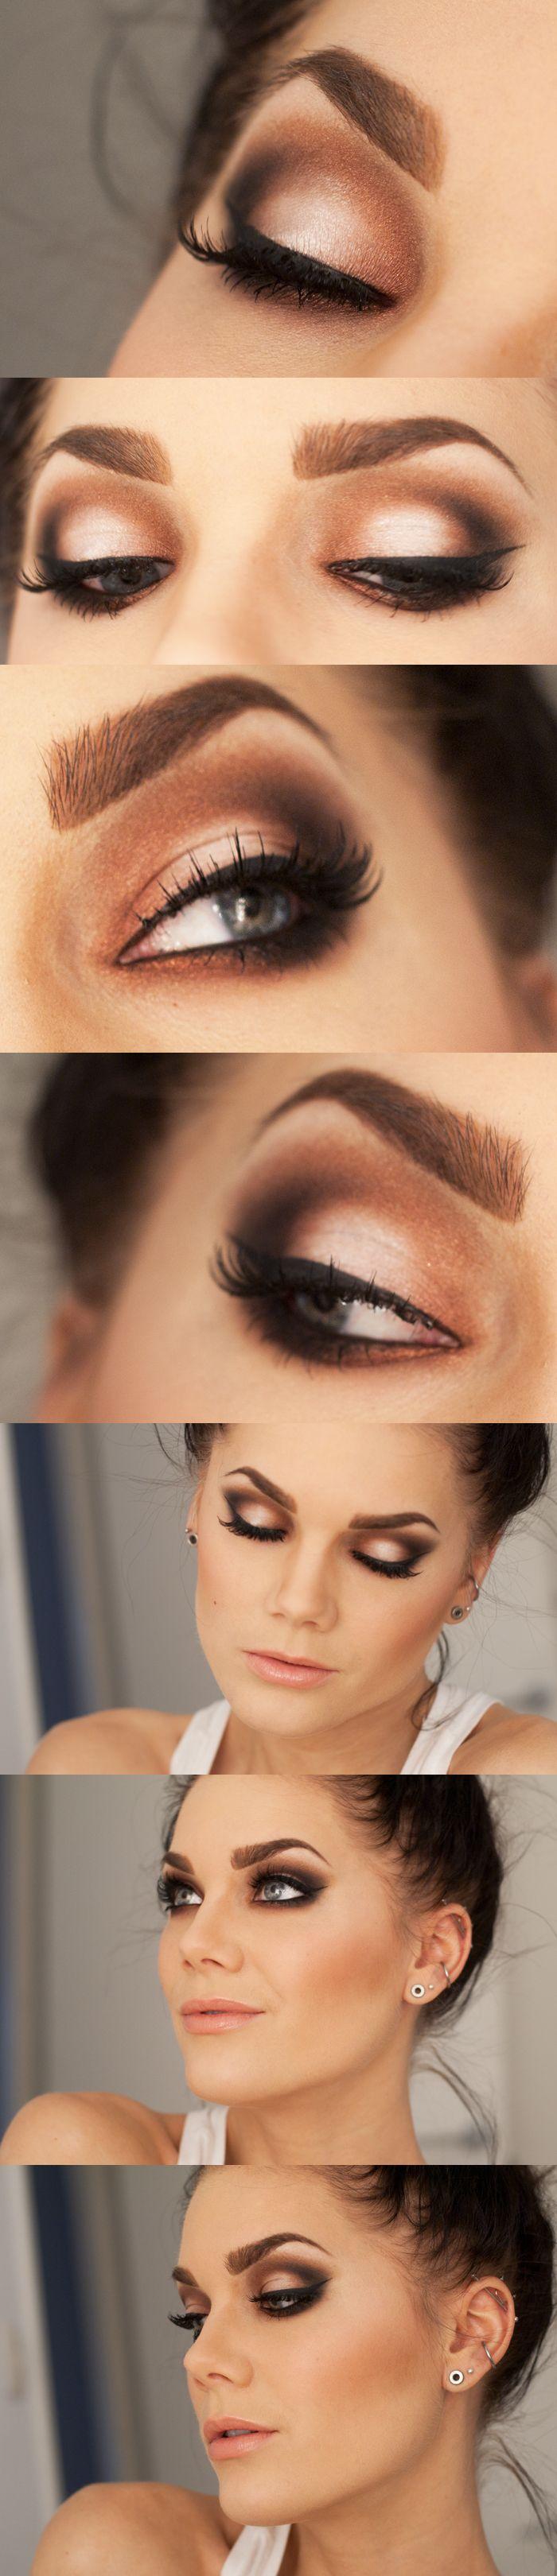 Smokey eye perfection - black and gold